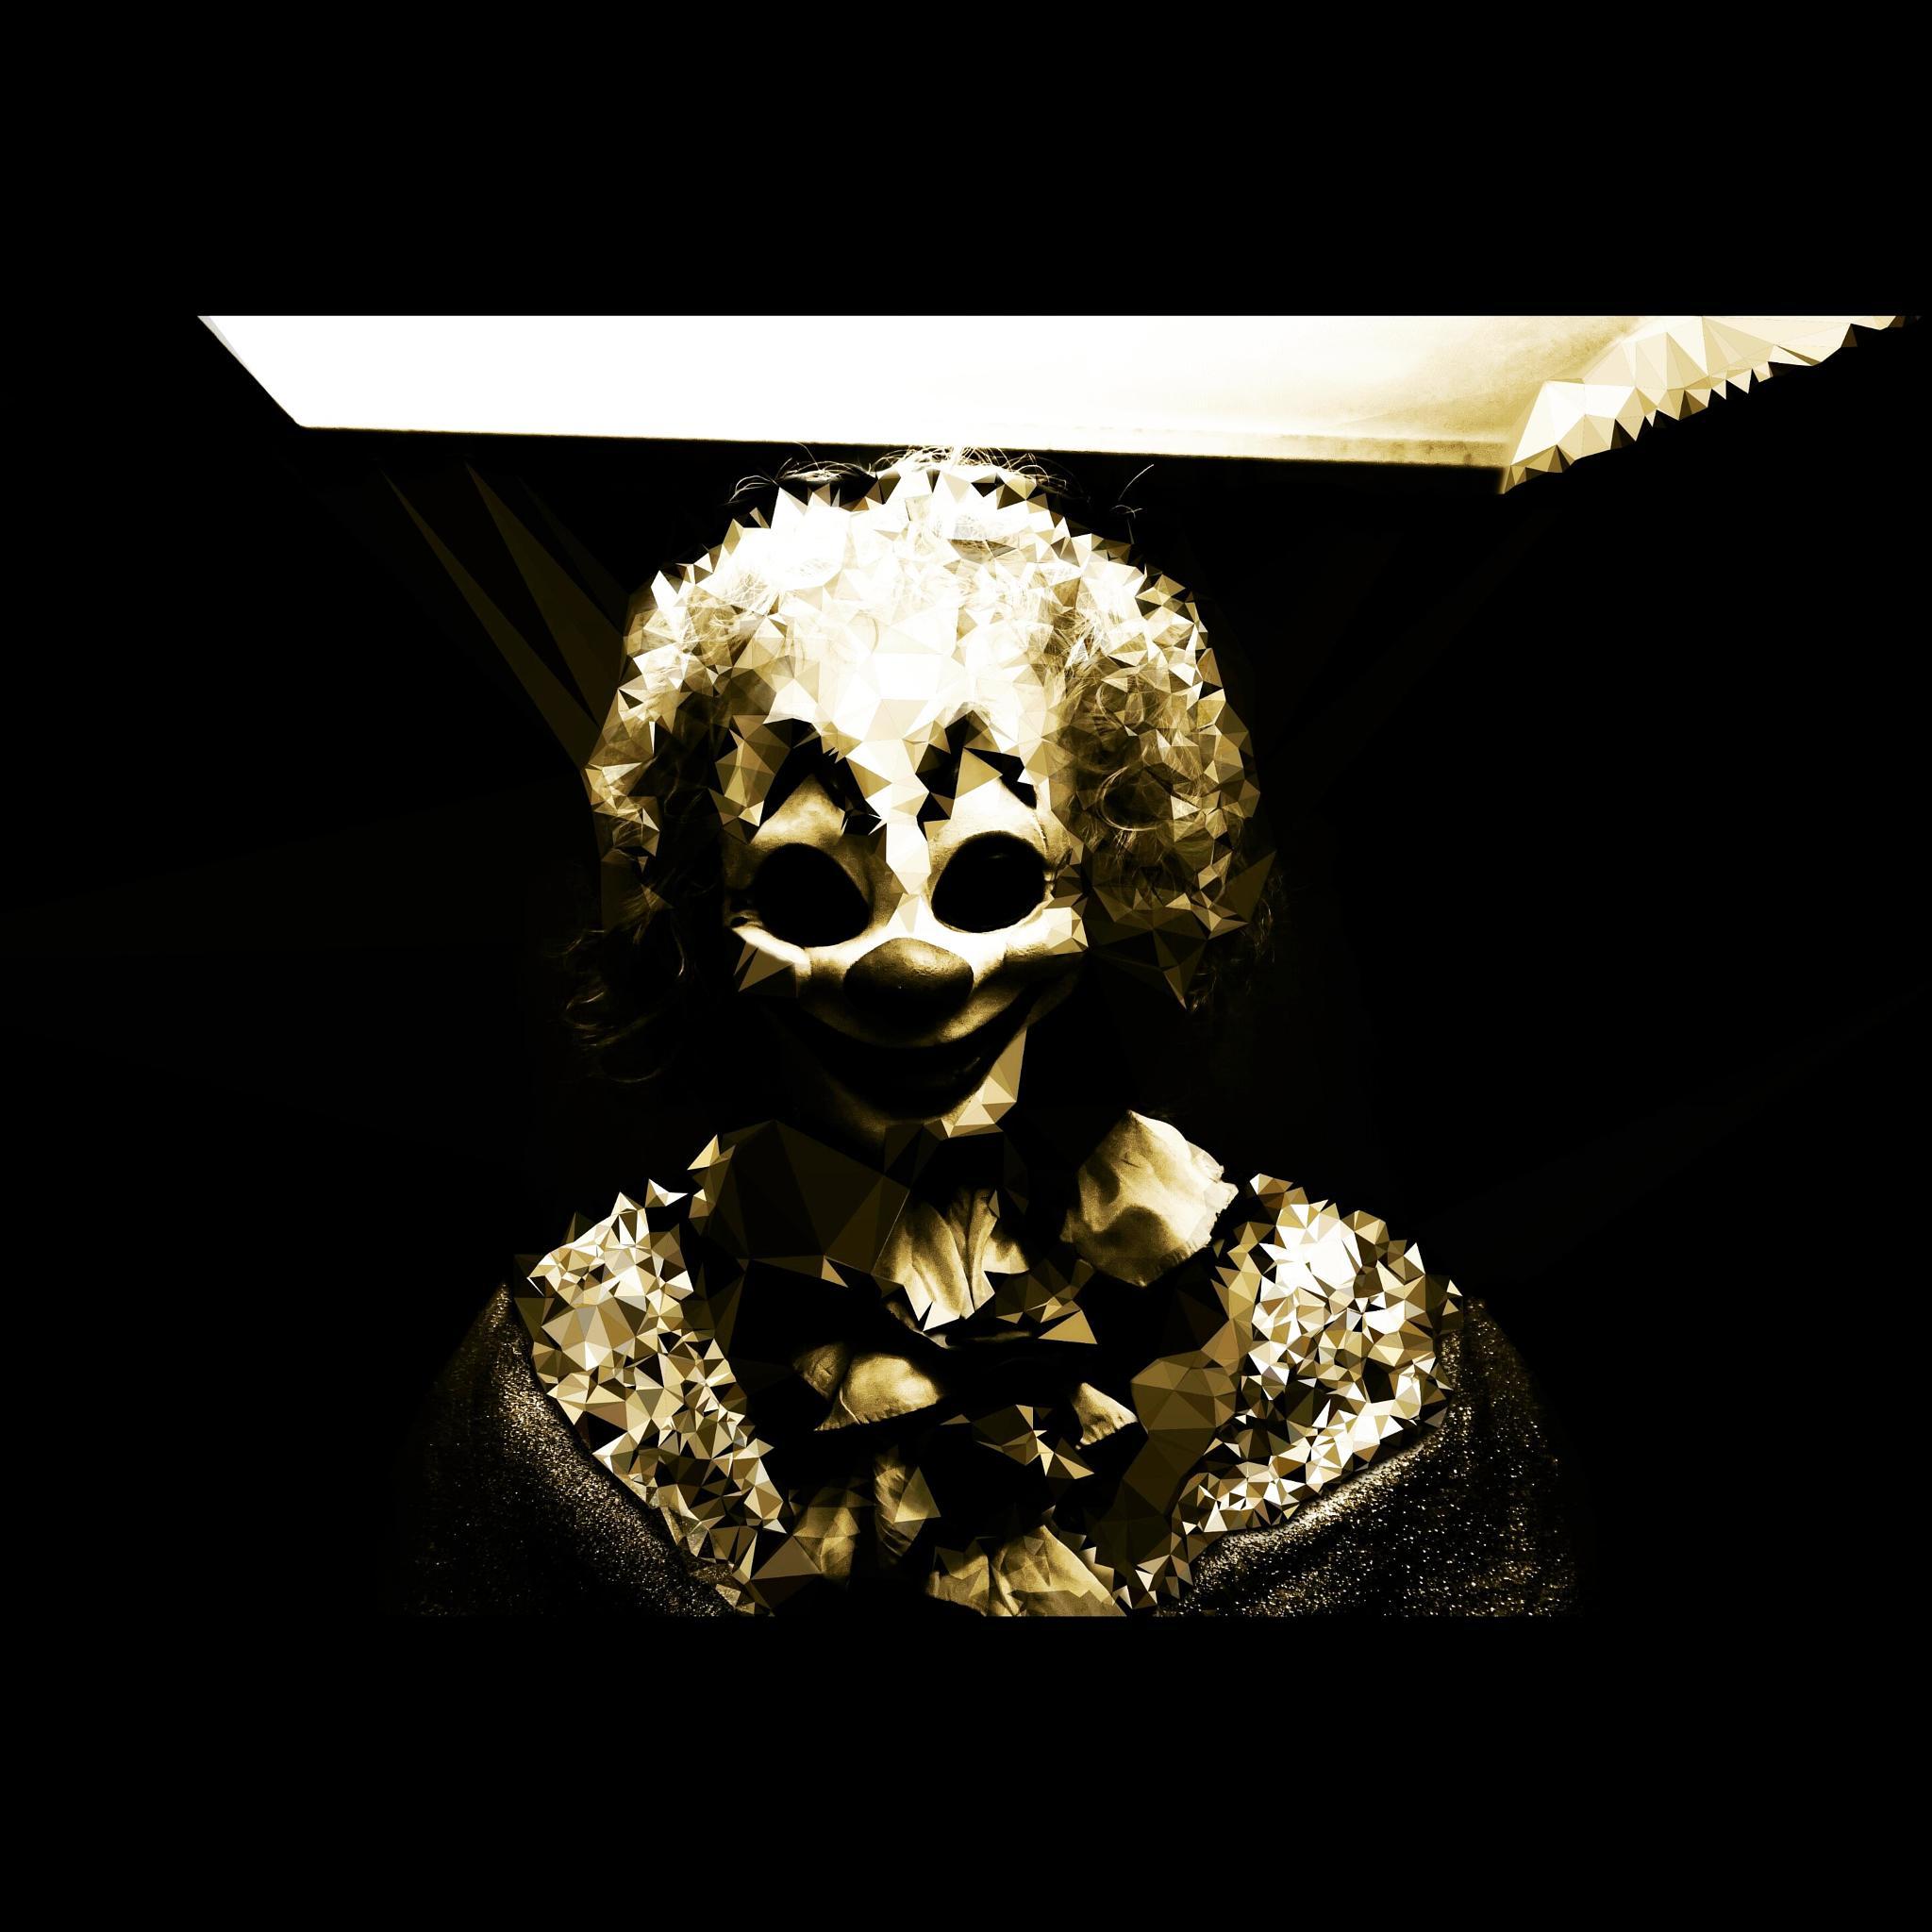 Curious Clown by Stuart Gallagher